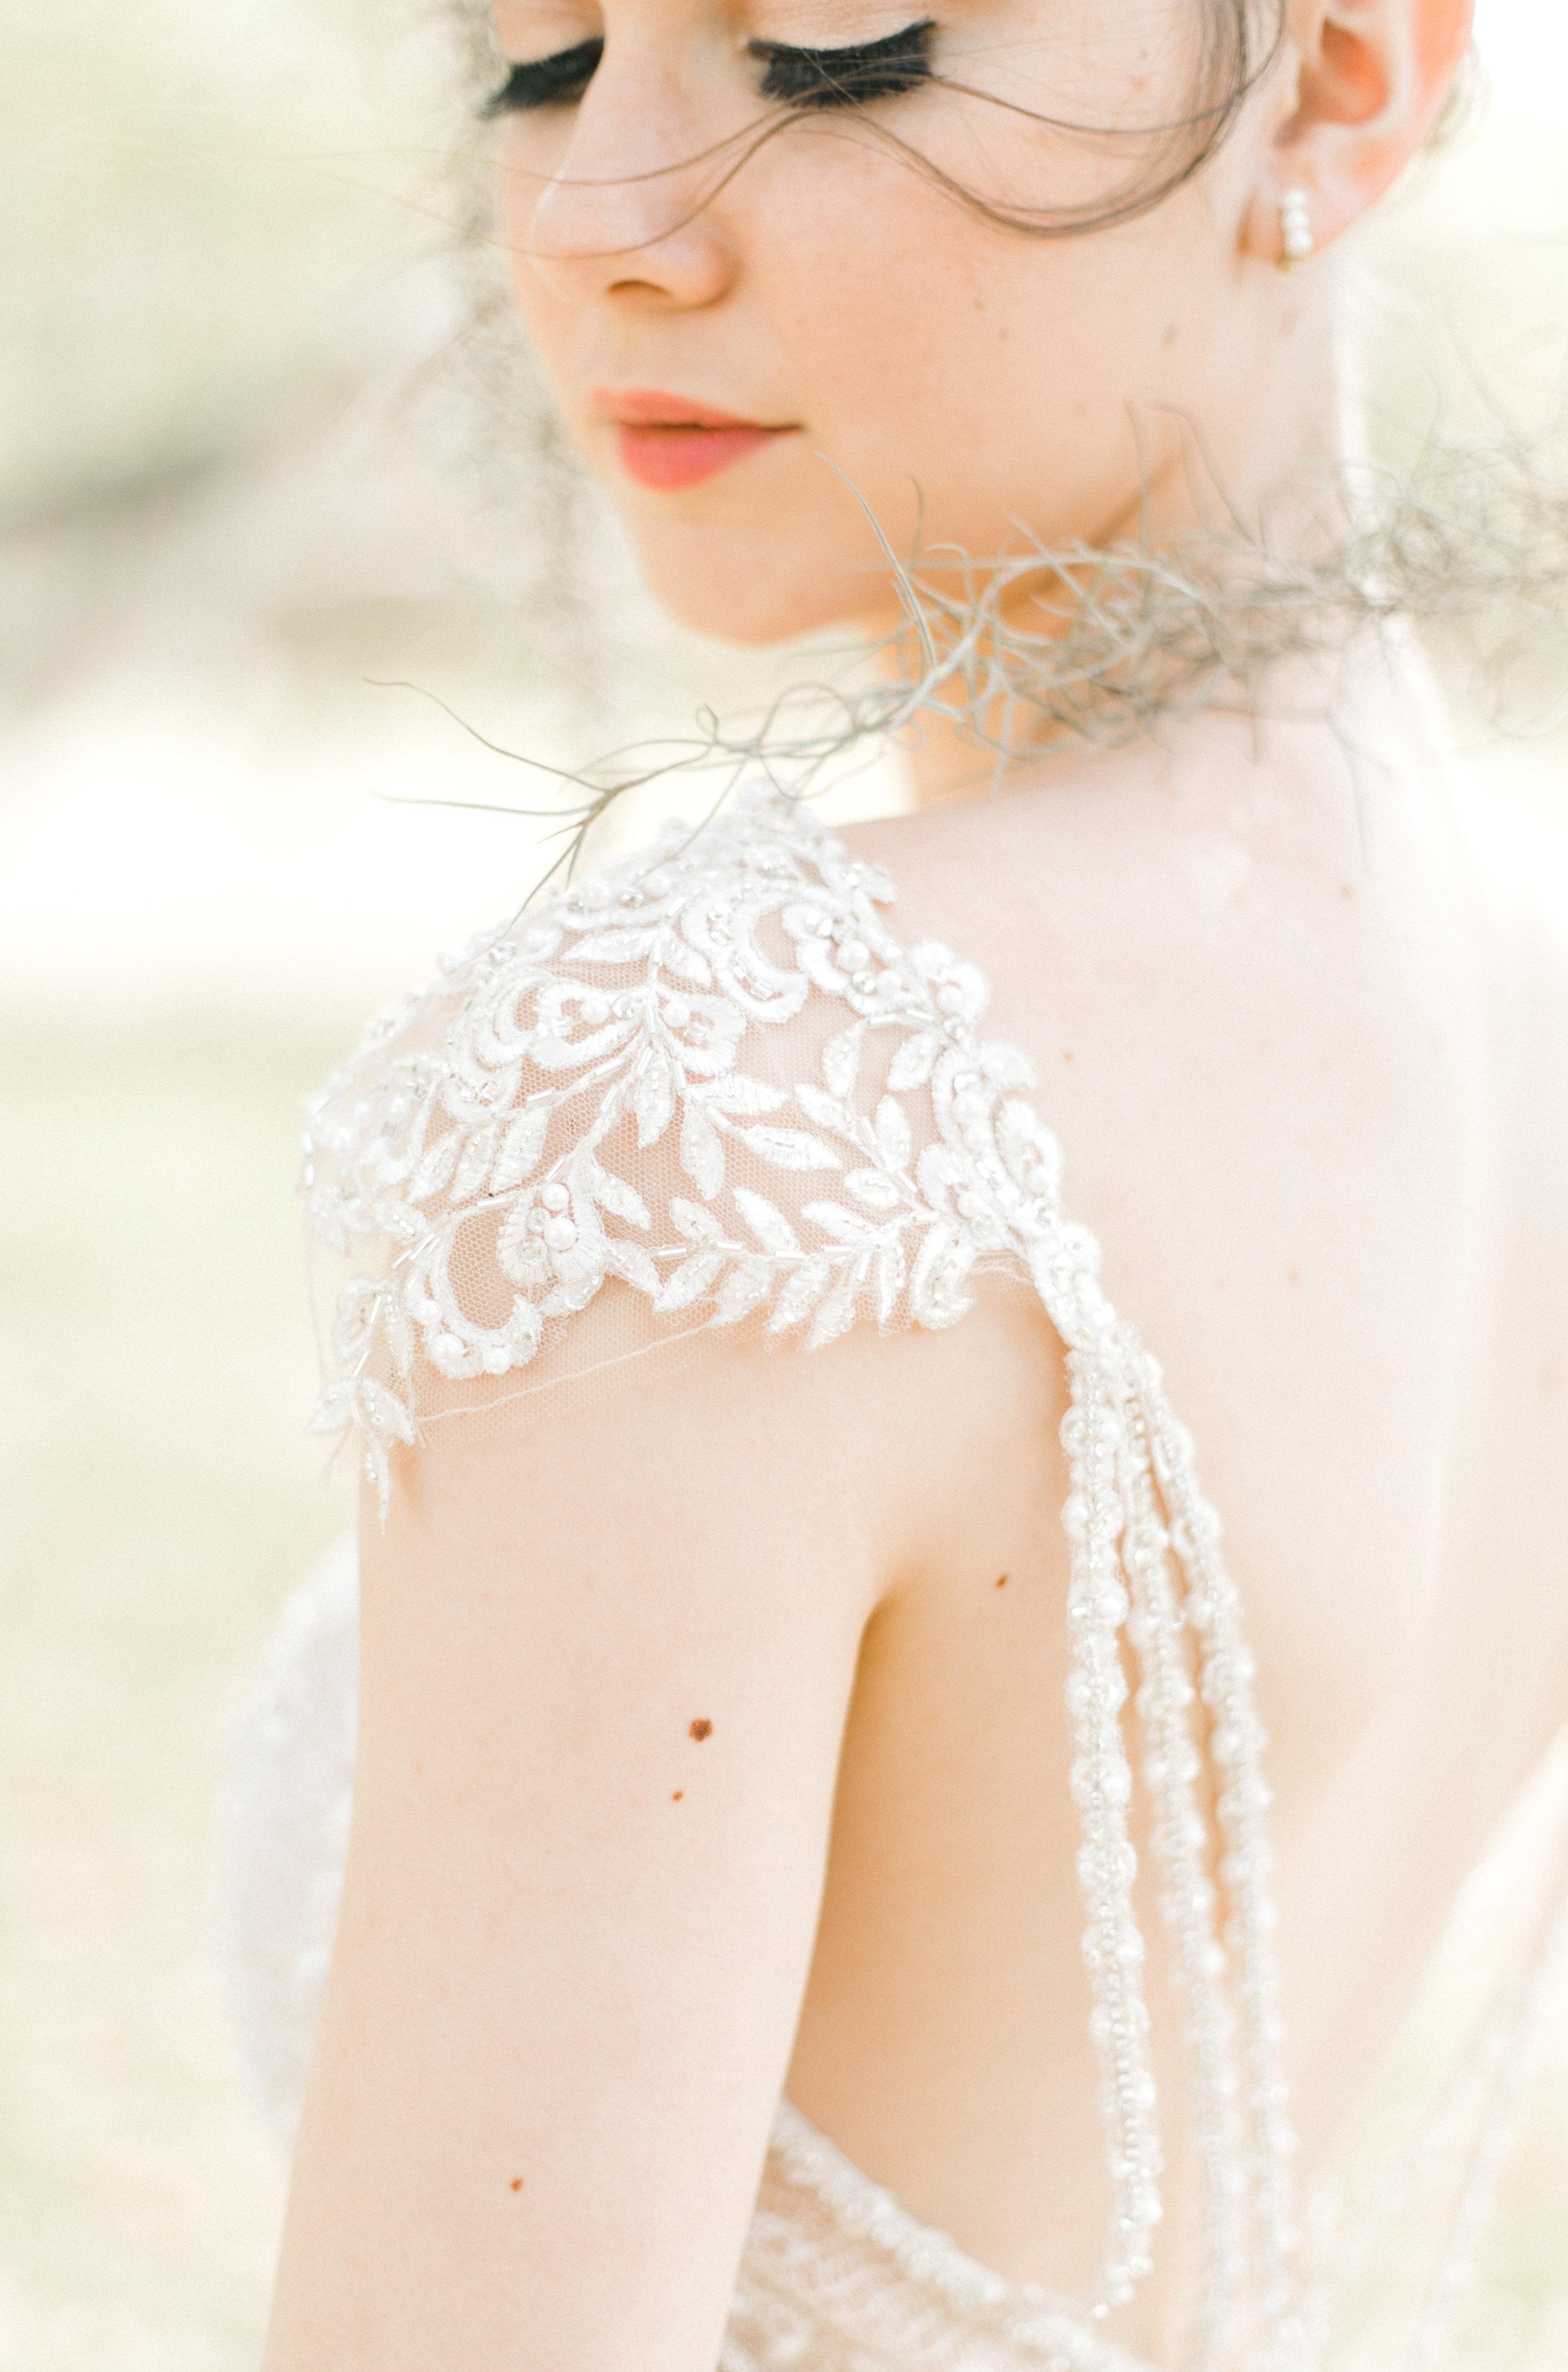 maggie-sottero-gabor-ivory-and-beau-savannah-wedding-dresses-savnanah-bridal-boutique-glamorous-wedding-dress-ivory-and-beau-wormsloe-elopement-Selyciayangphotograpy-83.jpg